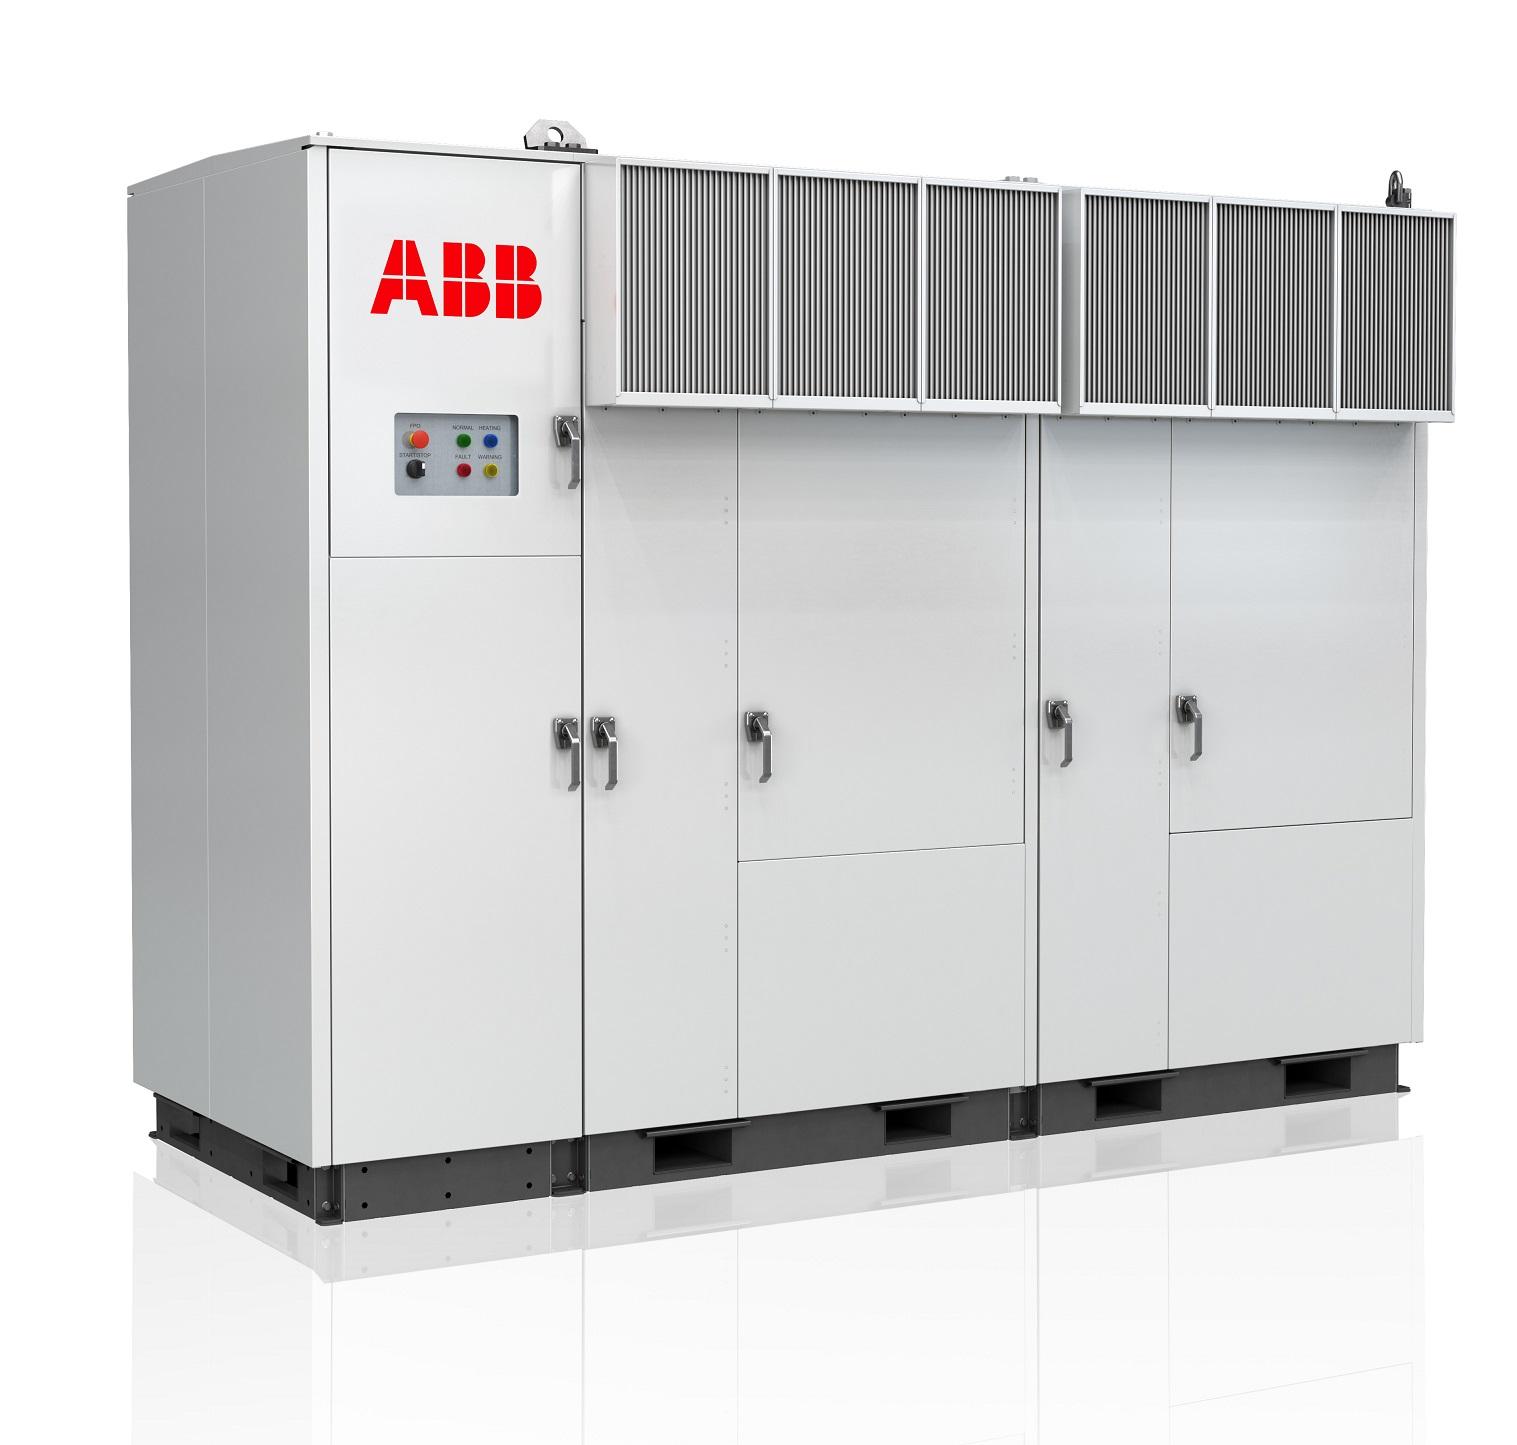 ABB ABB Starts Shipping Enhanced Central Solar Inverter